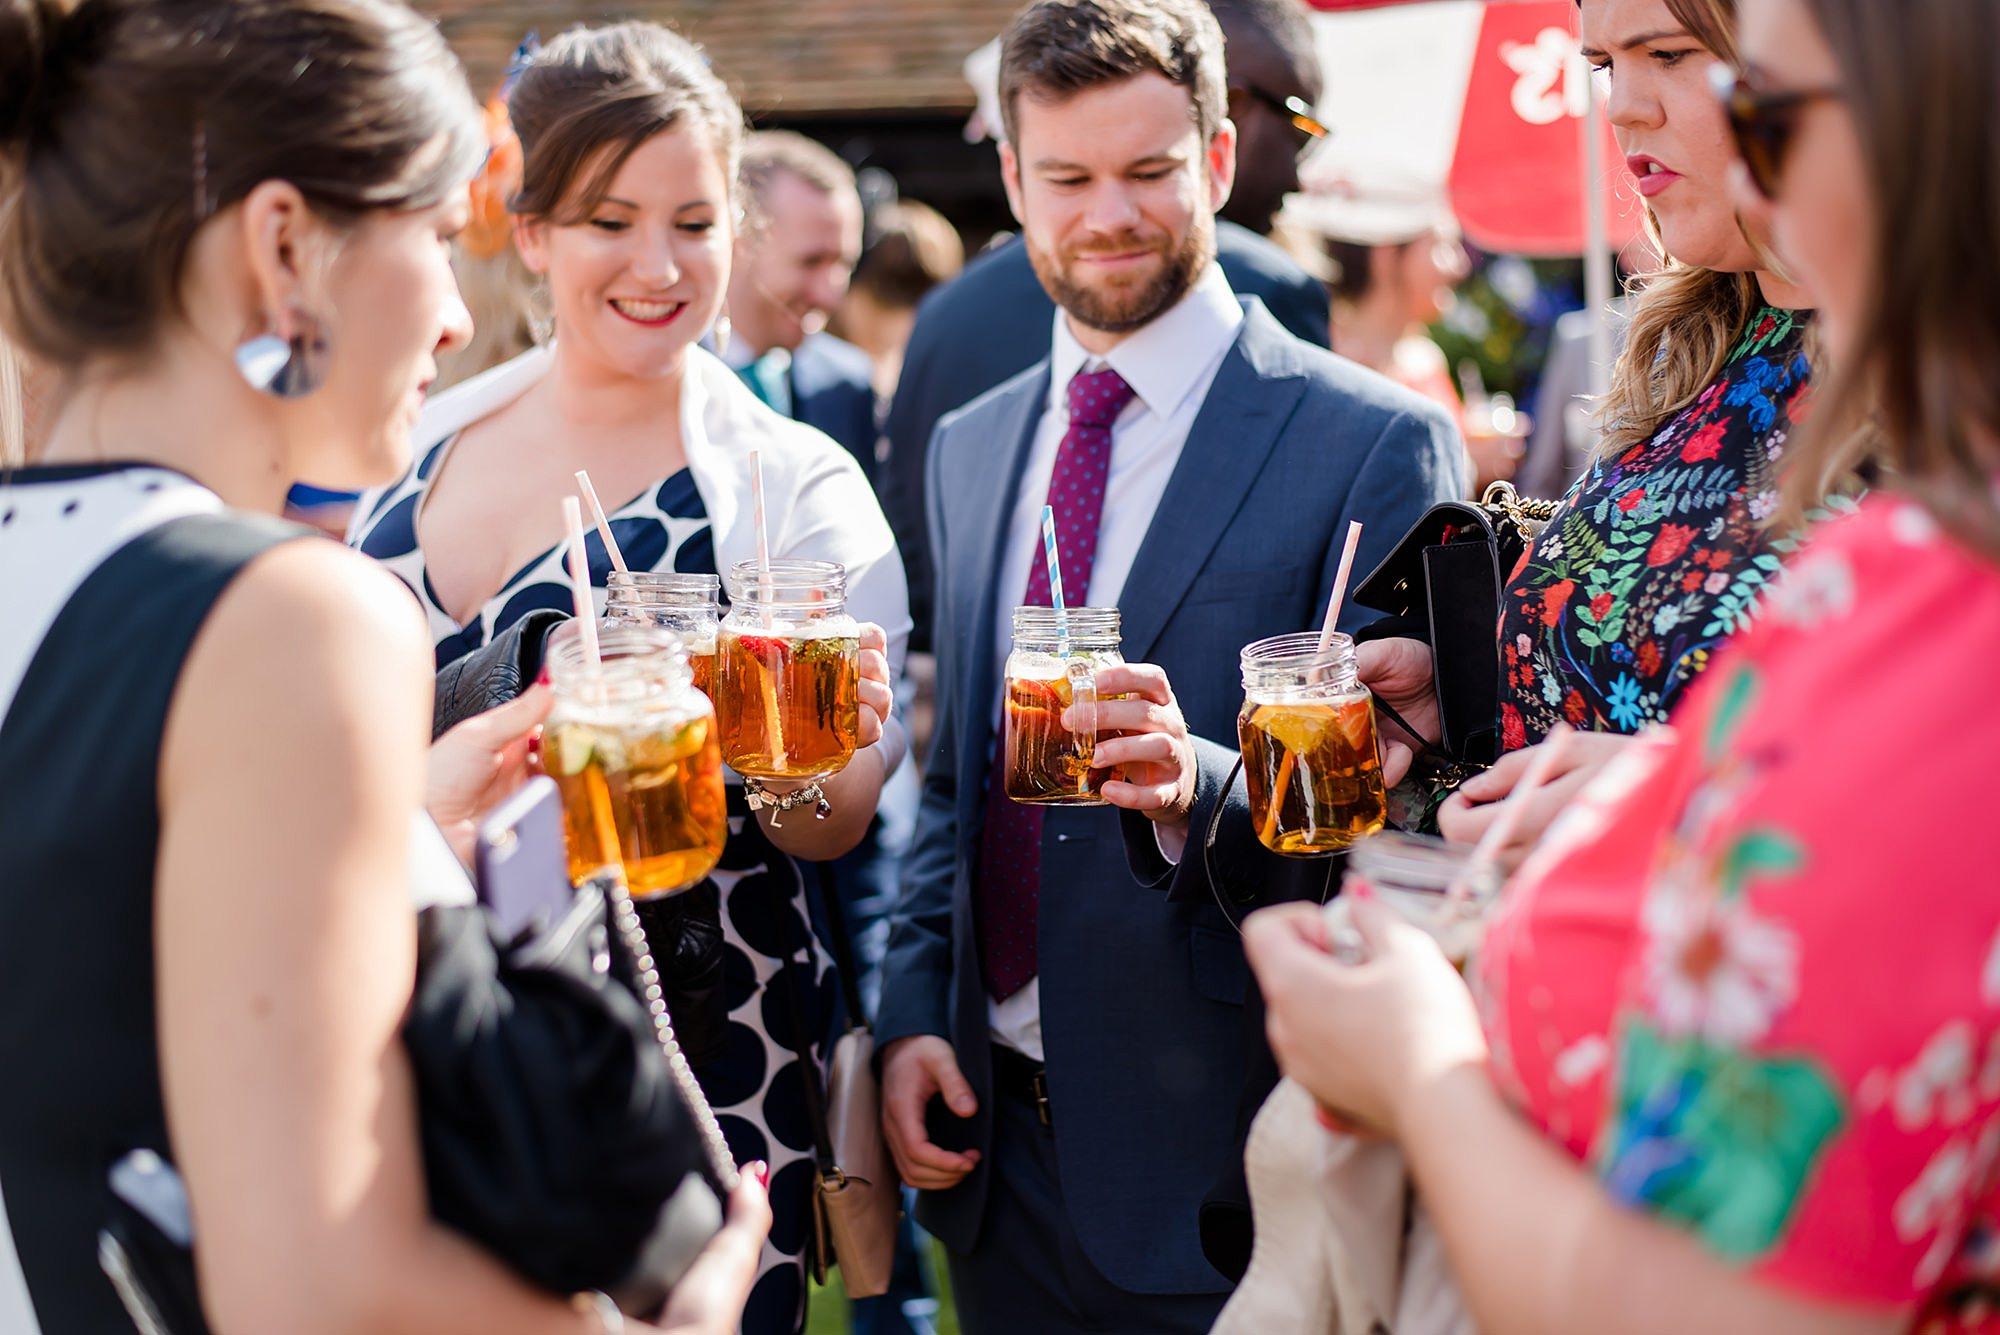 Lillibrooke Manor wedding guests enjoy pimms